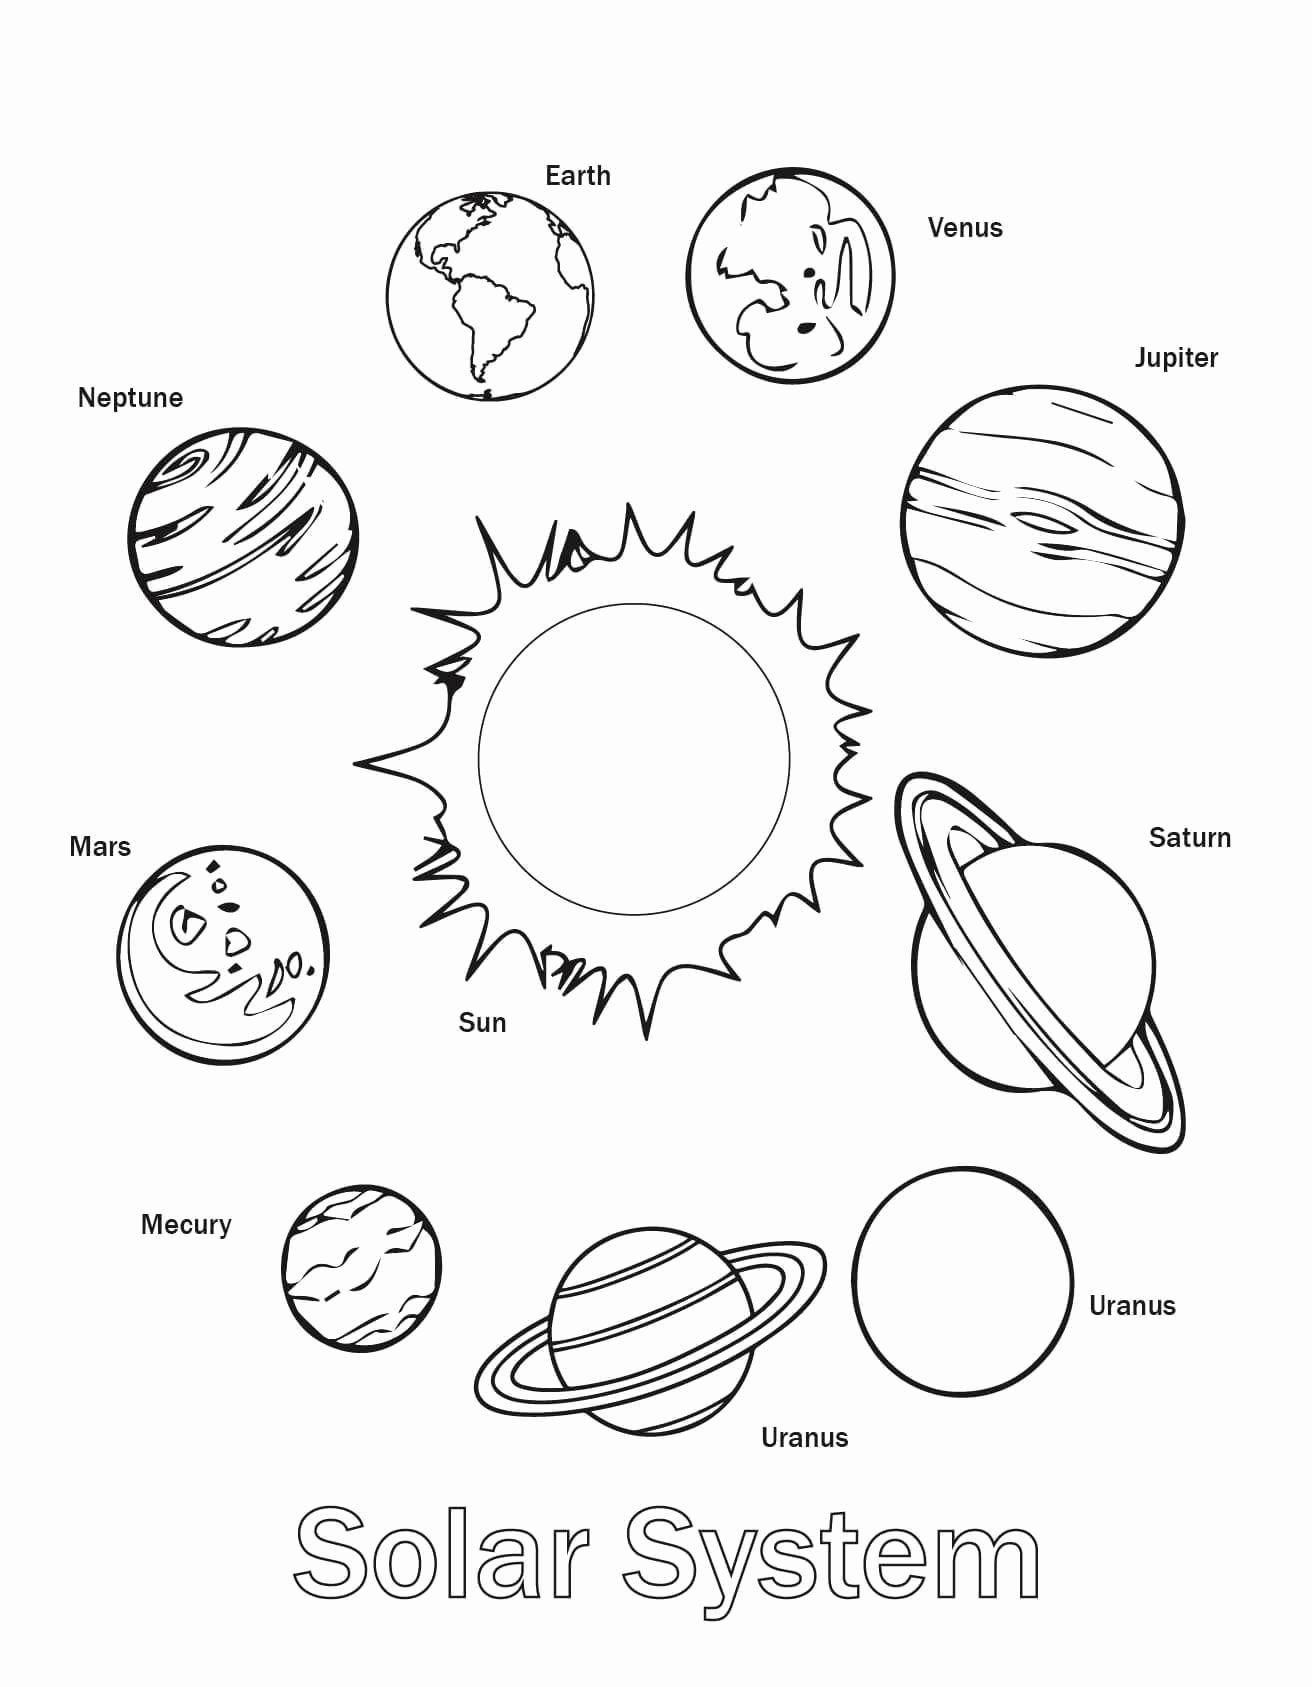 Color Black Worksheets for Preschoolers Awesome Free Printable solar System Coloring for Kids Color Black